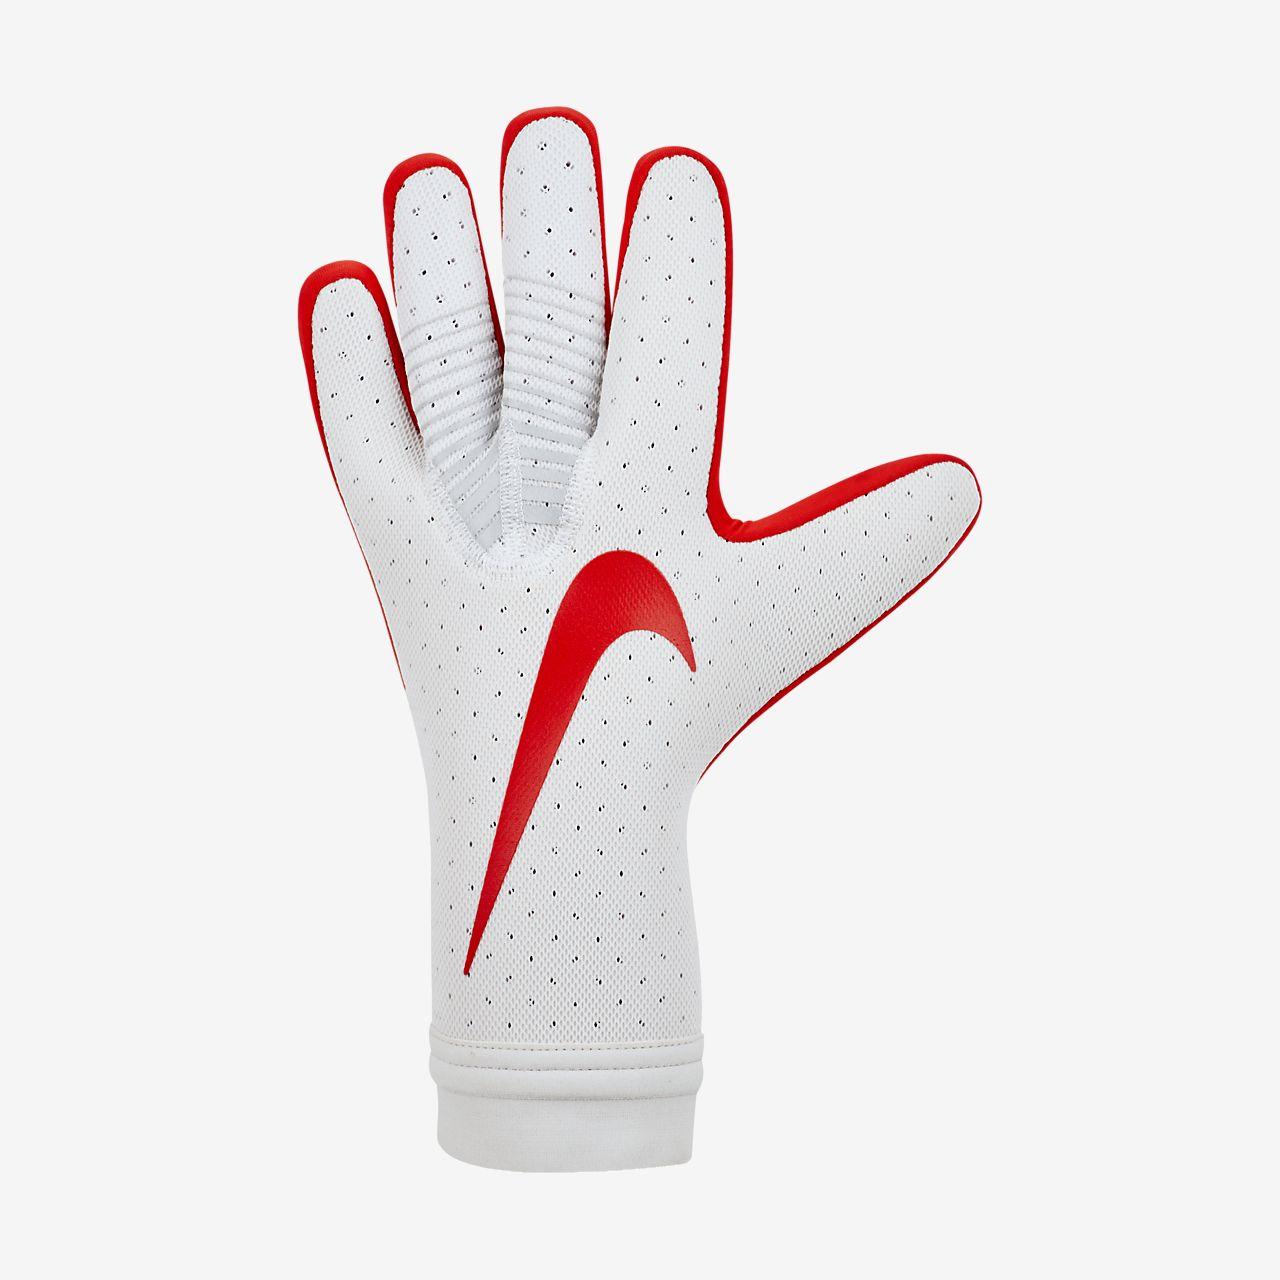 55cabe80aef2c Nike Goalkeeper Touch Elite Football Gloves. Nike.com GB